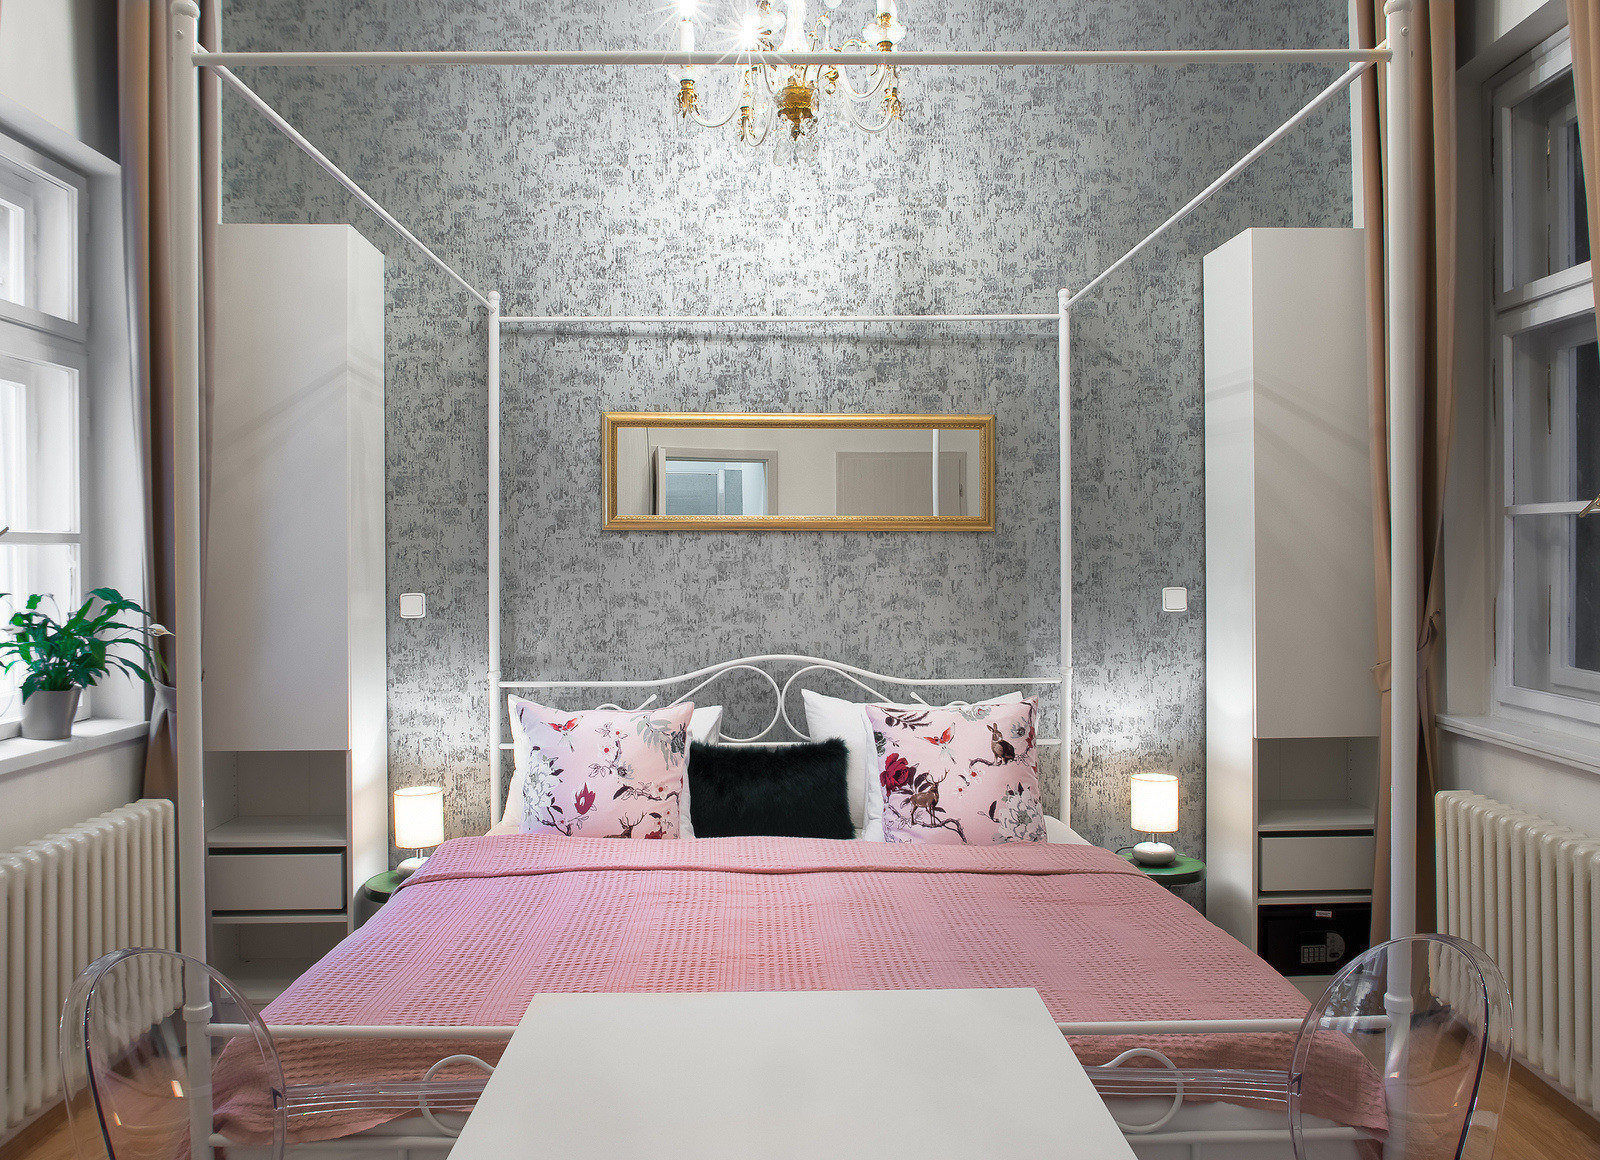 7 tales suites studio cinderella prague residence for Royal boutique residence prague tripadvisor